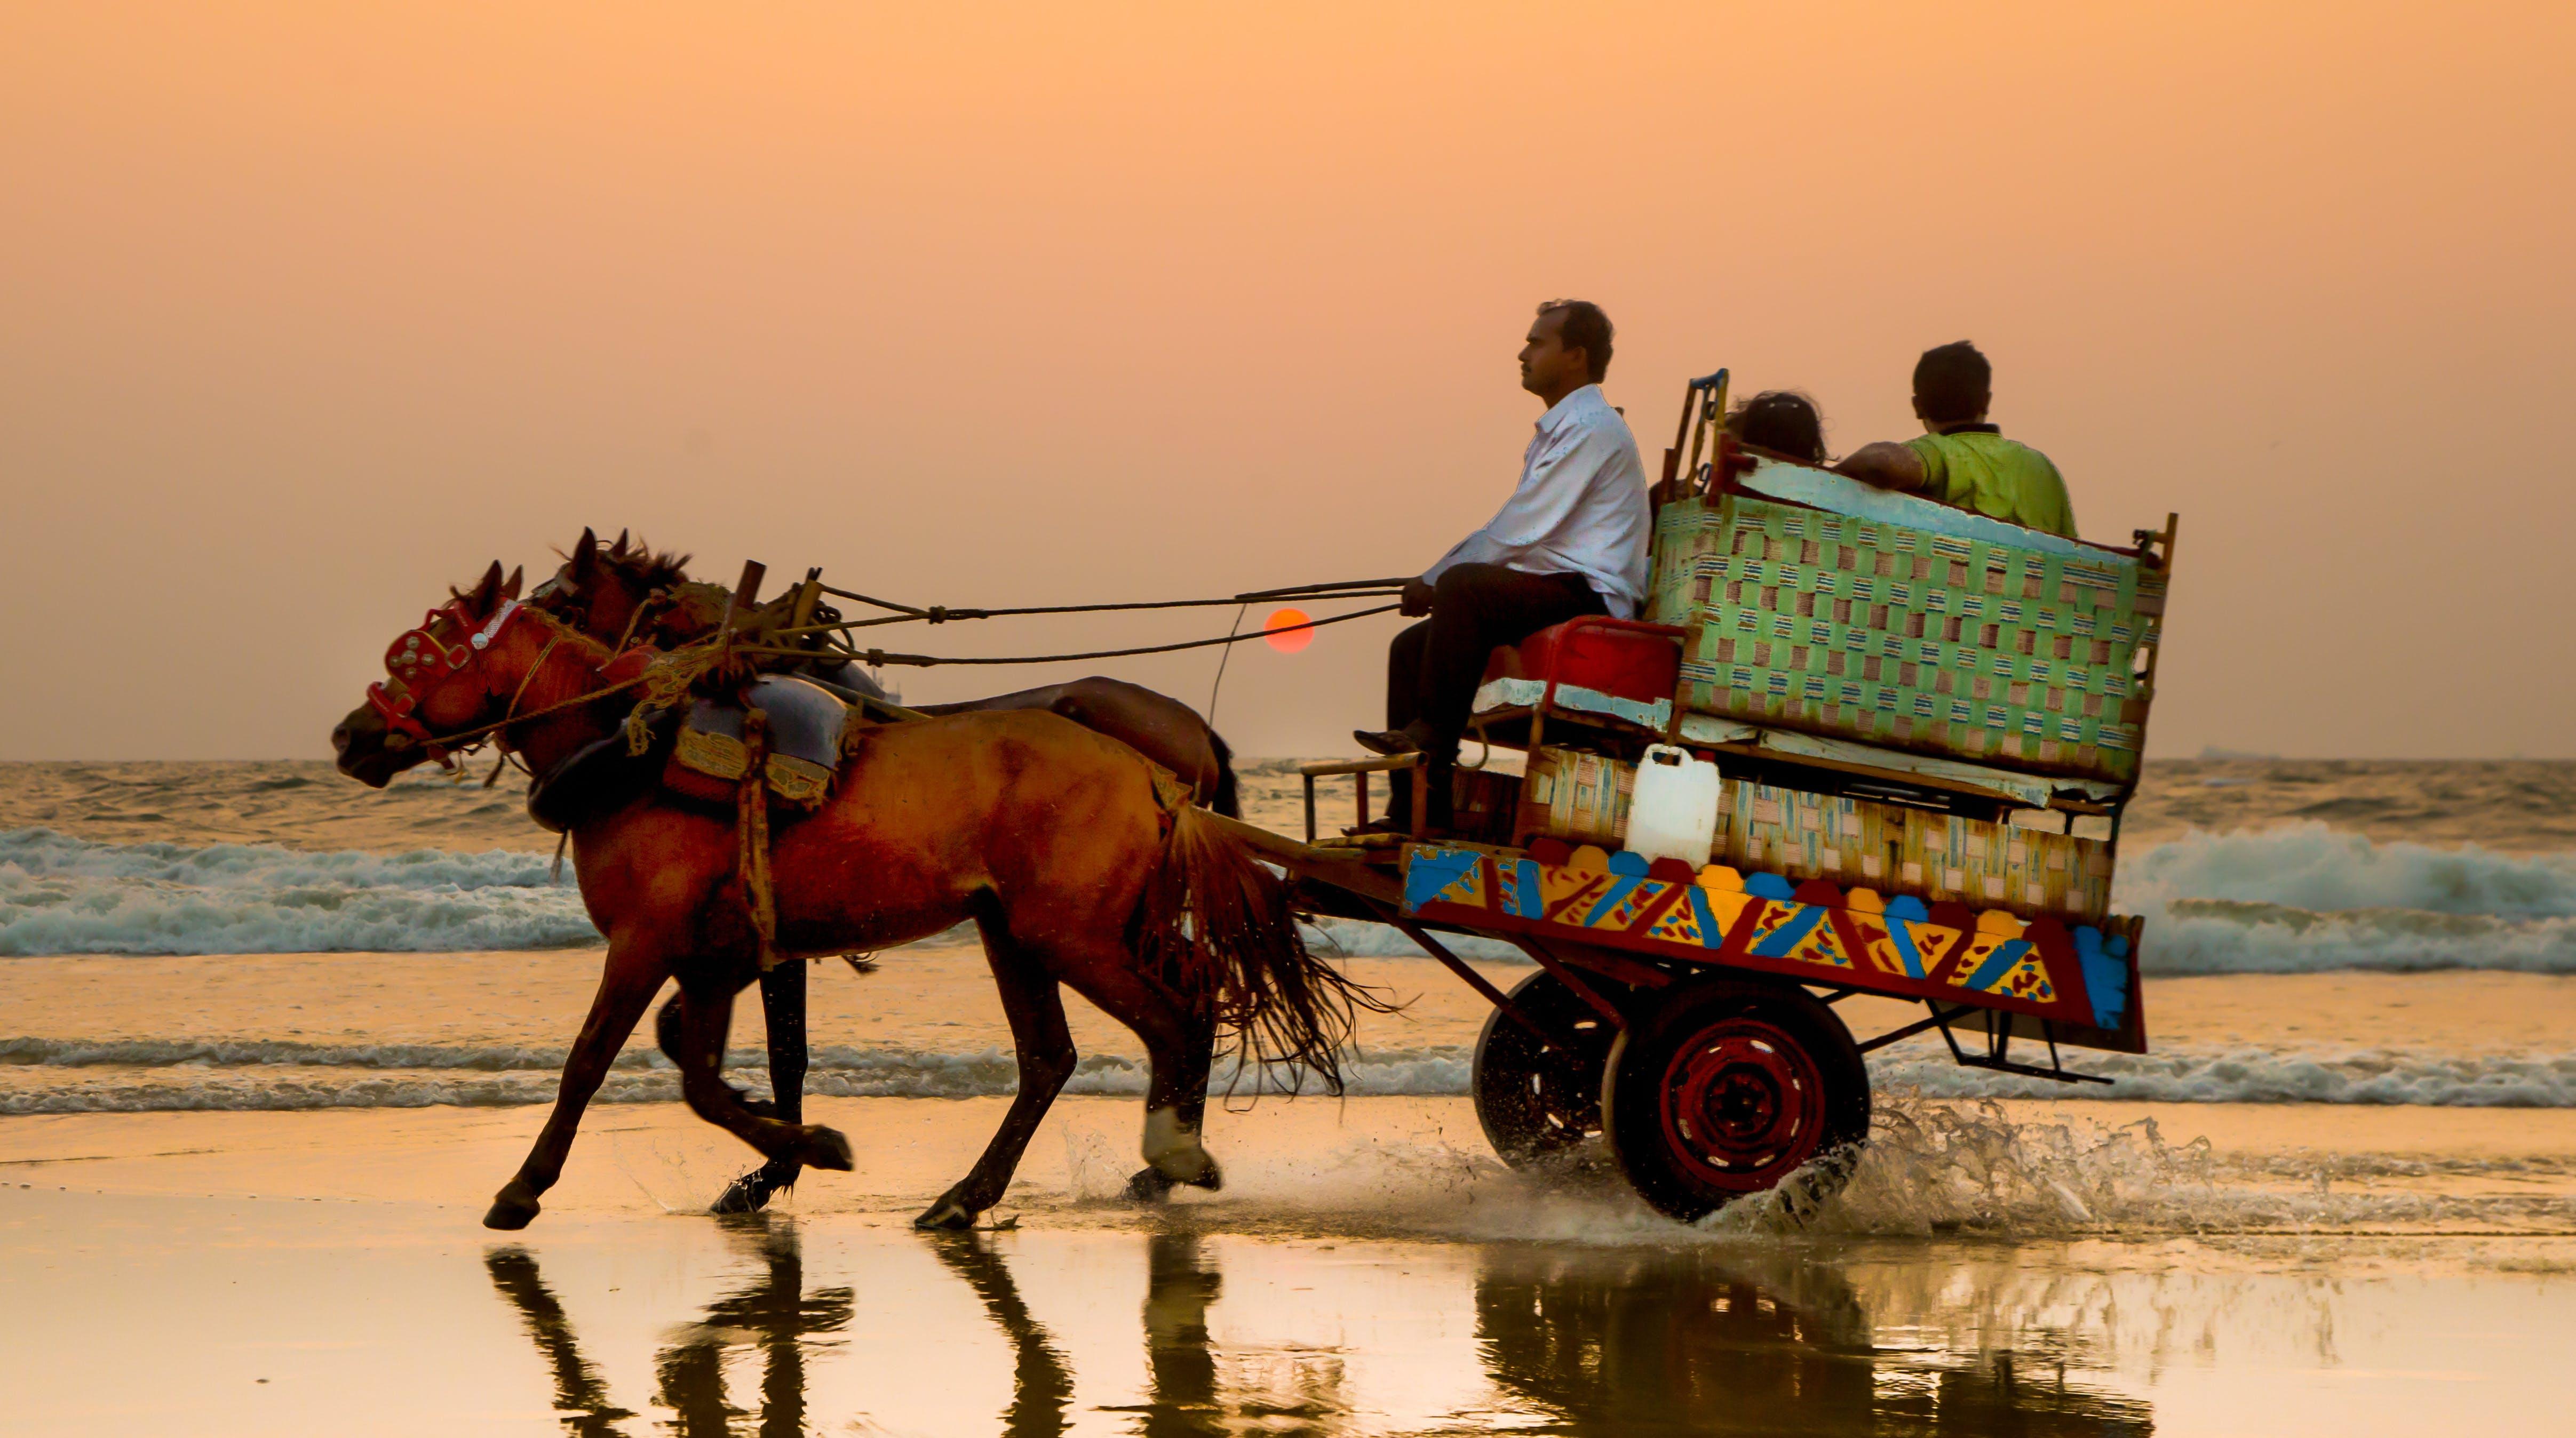 Free stock photo of beach, evening, evening sky, horse